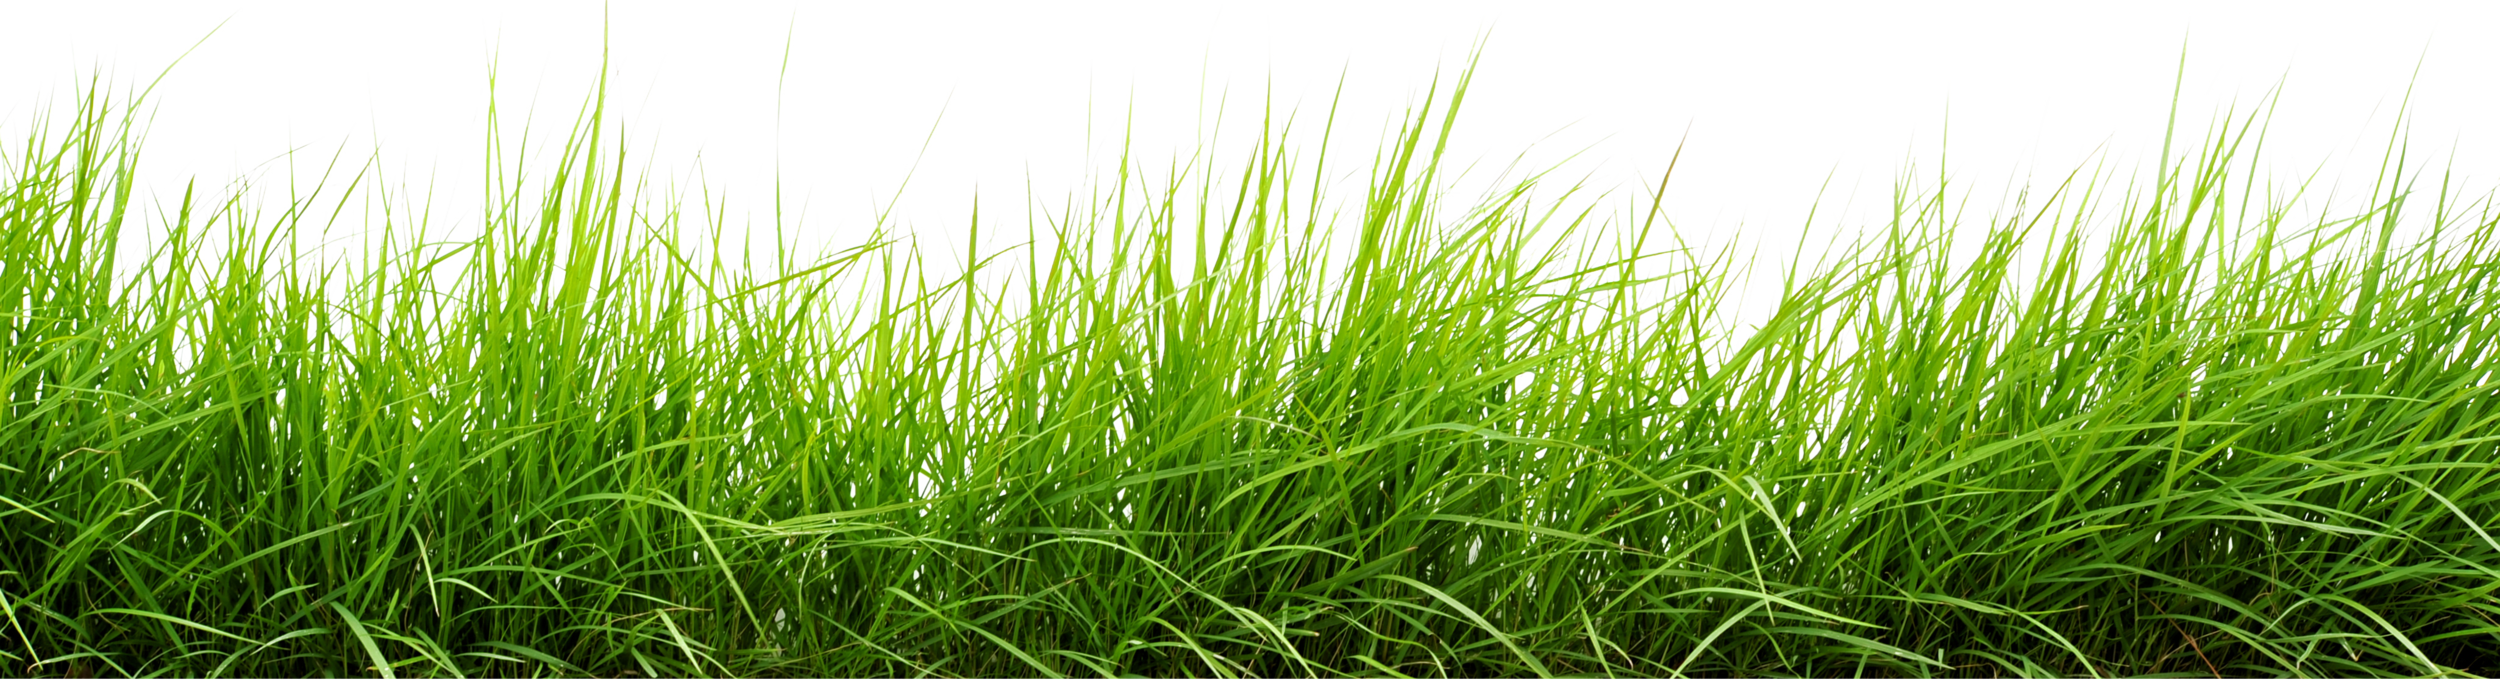 Grass PNG Transparent Grass.PNG Images..